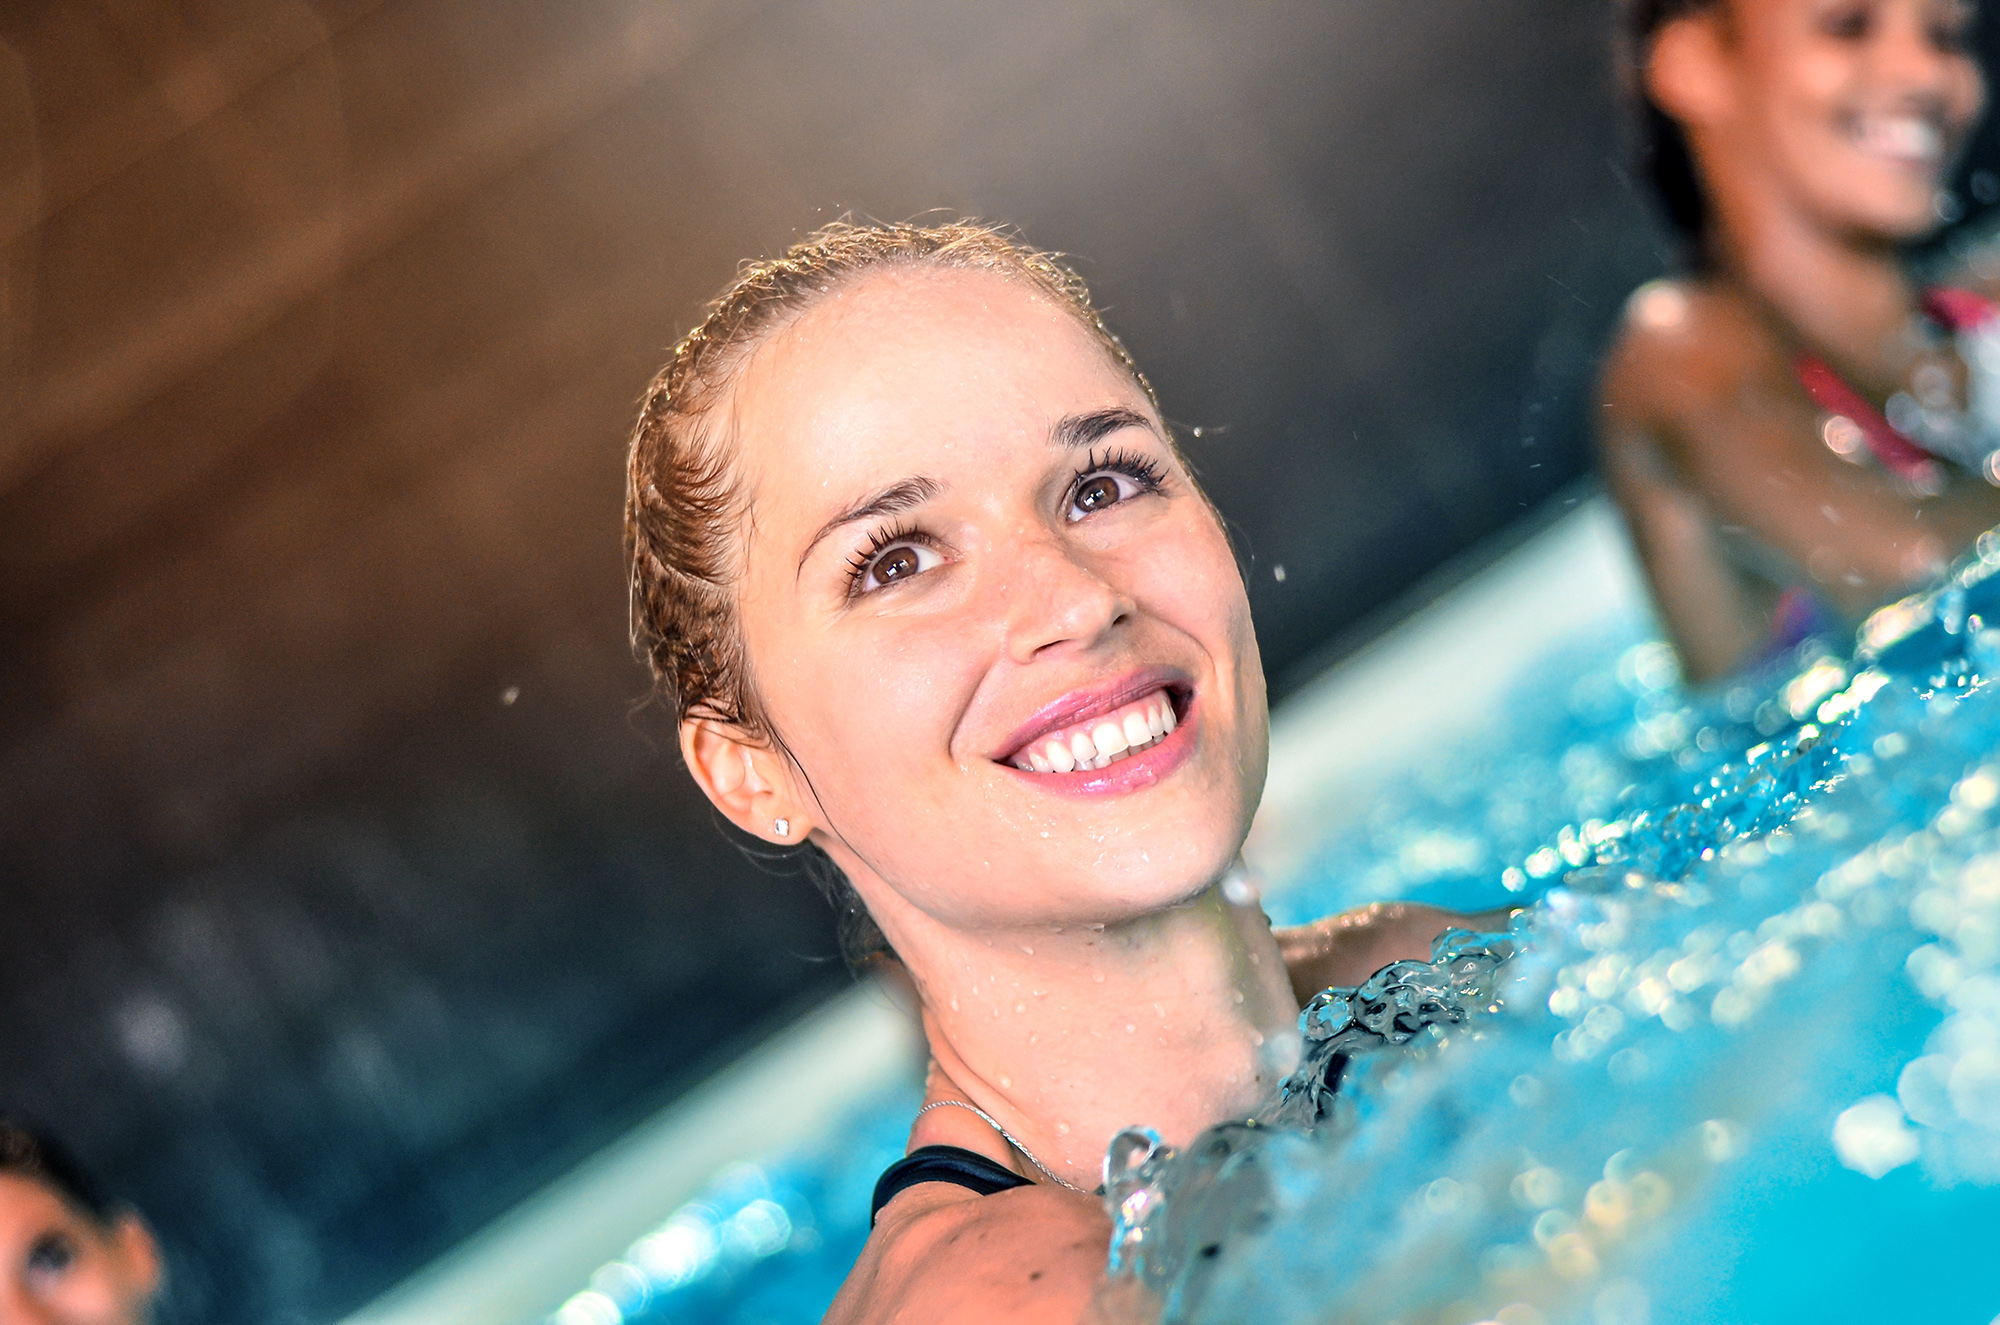 Photo cours aquasoft dans la salle Olympe Aqua Fitness